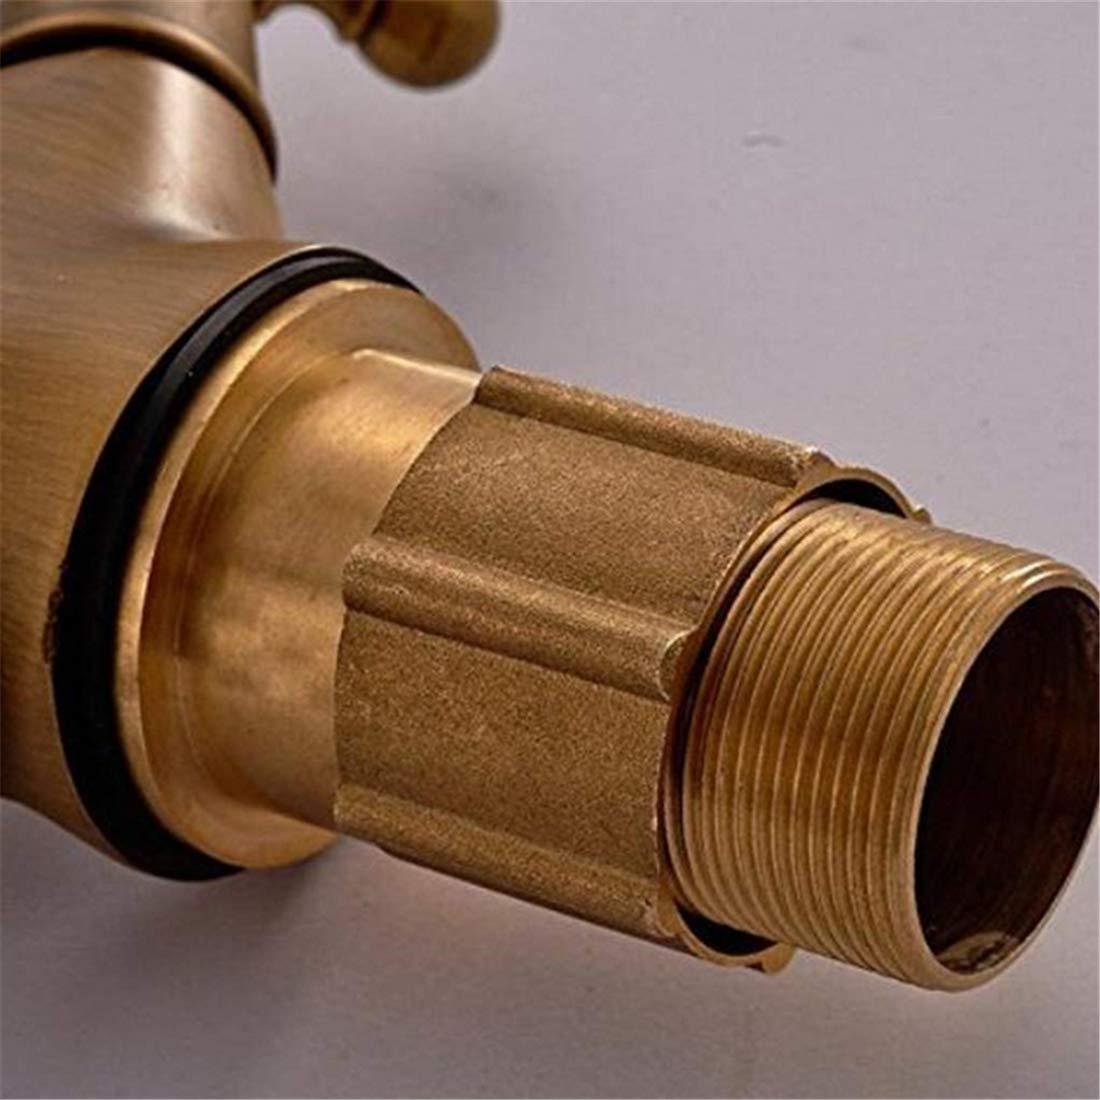 Retro Faucetbasin Mixer Tap Sink Basin Mixer Tap Single Brass Spiral Mixer